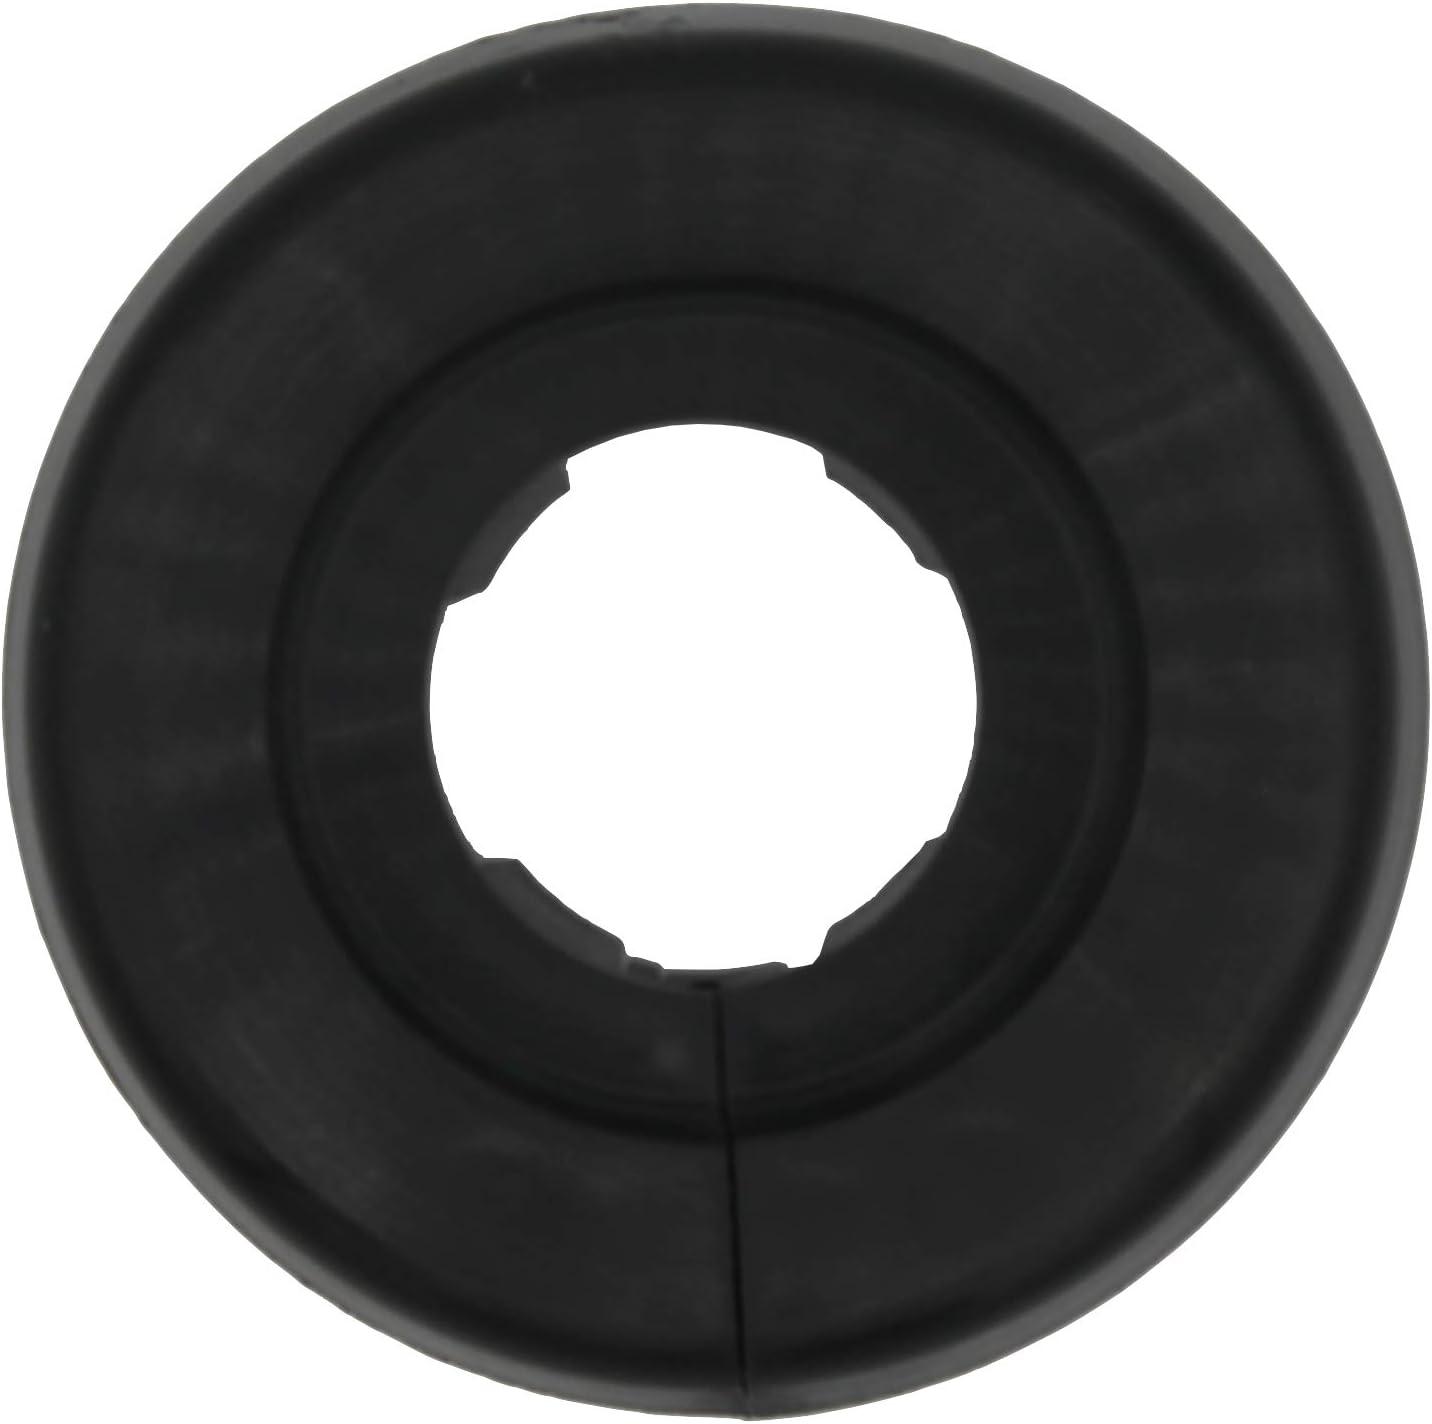 18mm, 18mm Negro Intenso marr/ón 22mm; protectoras radiador // rosetas // cubiertas pl/ástico negro RAL 9005 2 Piezas de rosetones para tubos de calefacci/ón para tubo di/ámetros: 15mm gris